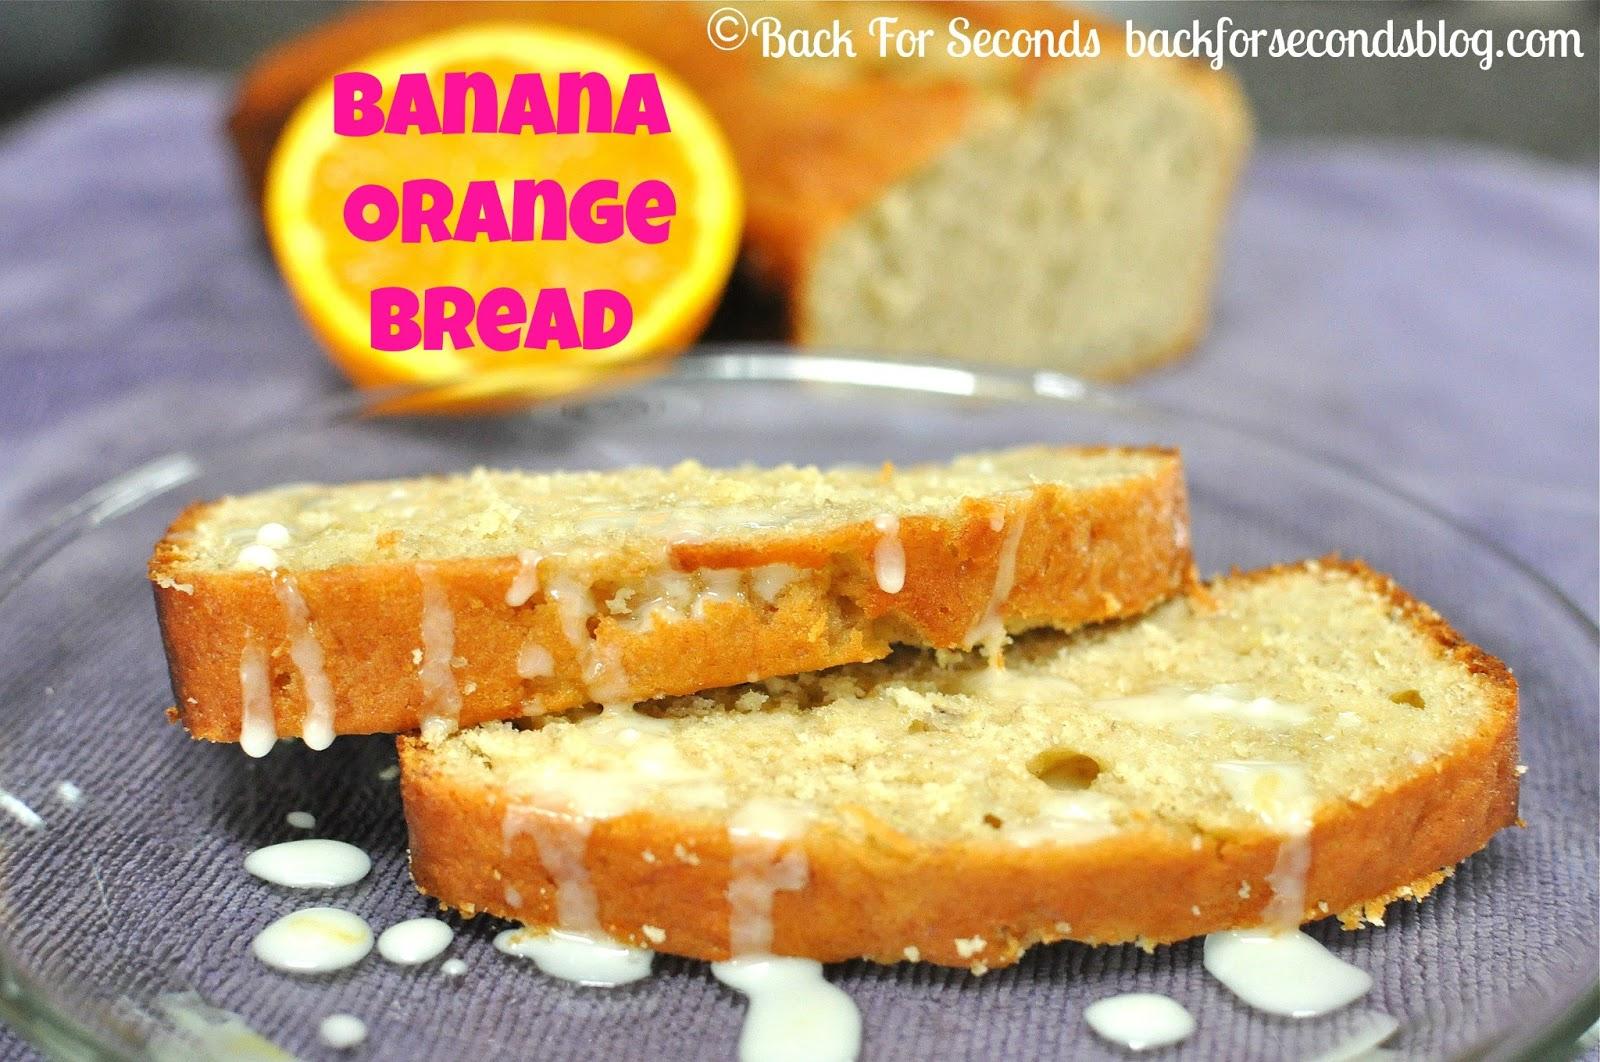 Banana Orange Bread {Guest Blogger: Back For Seconds}